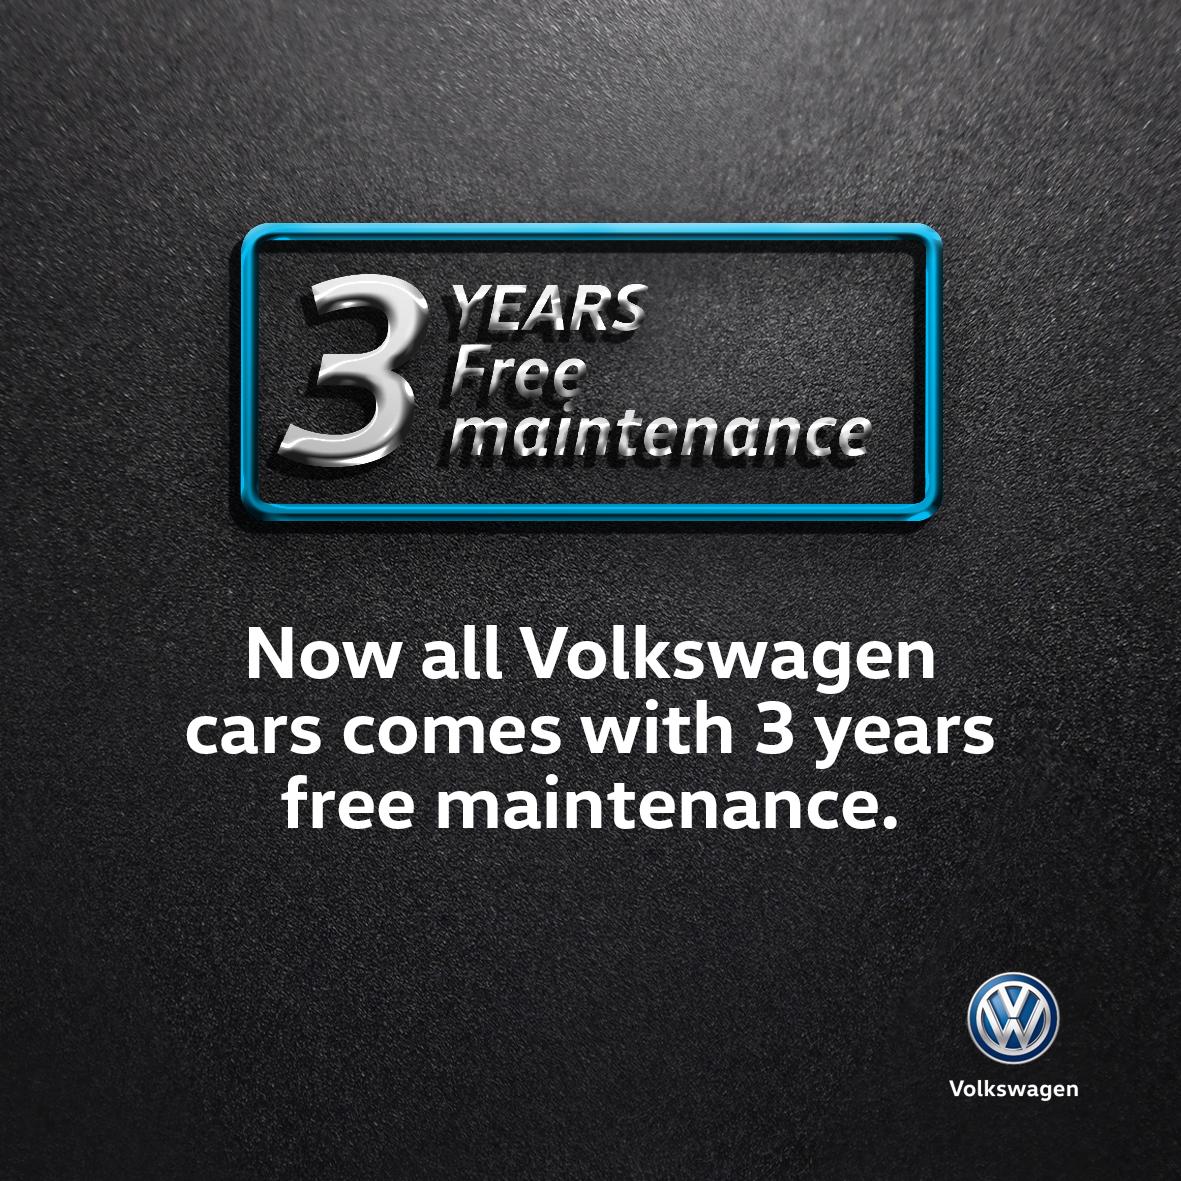 Volkswagen Introduces Three-Year Free Maintenance